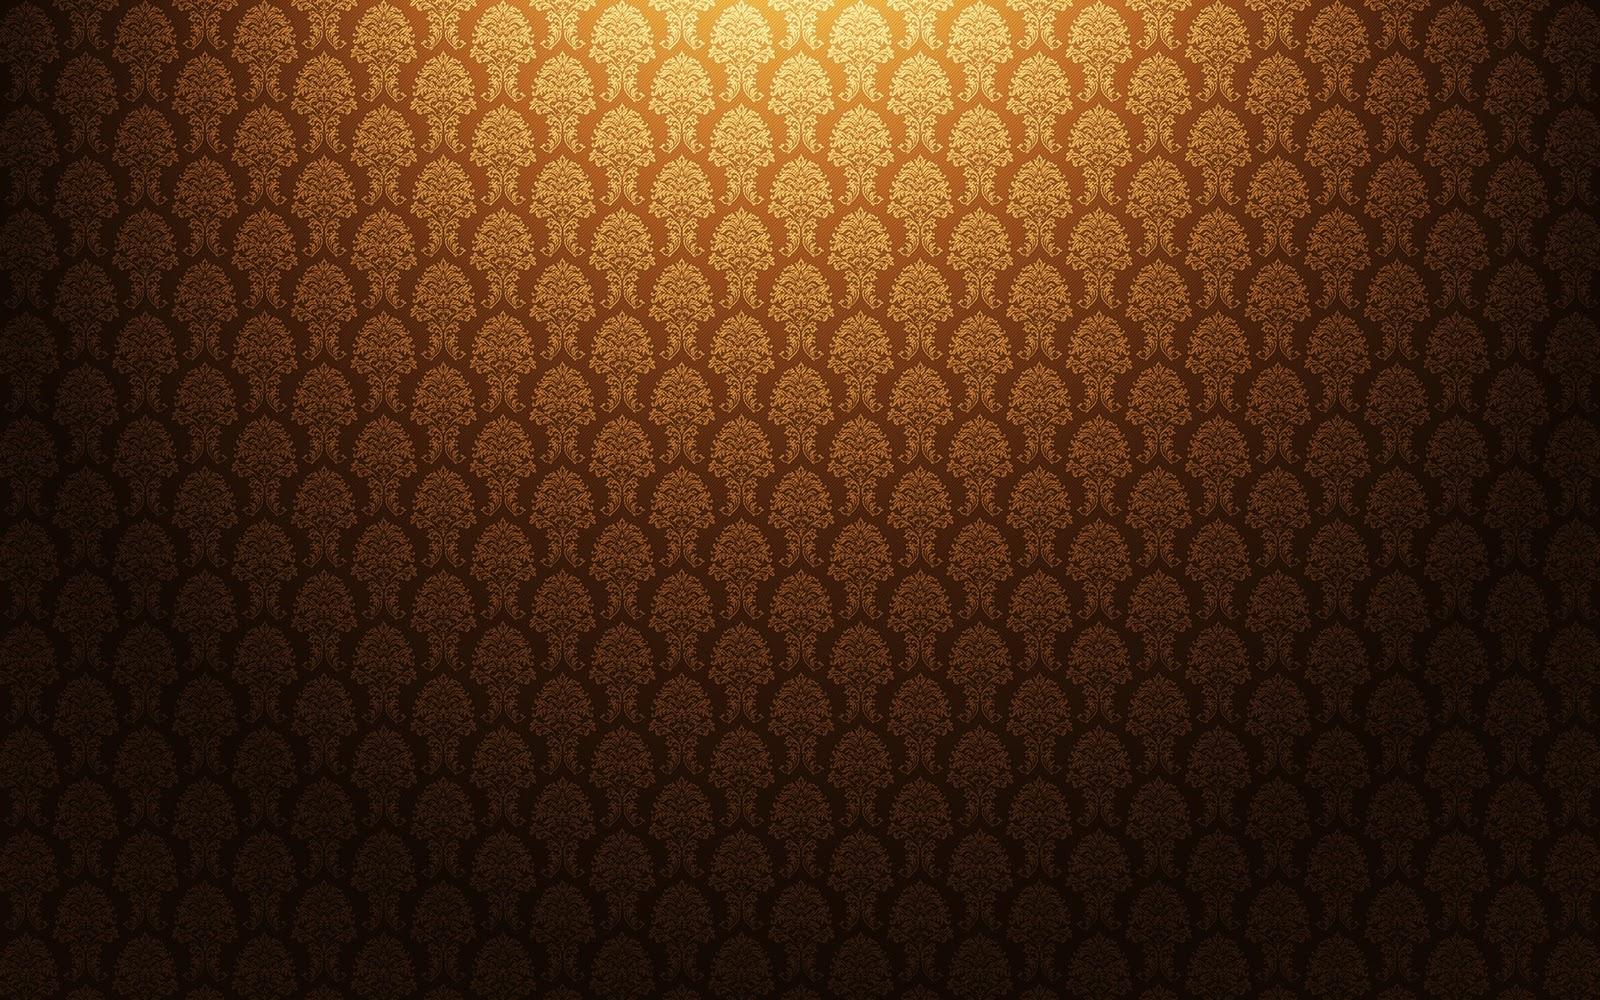 http://1.bp.blogspot.com/-WKjEAPTIR2s/TZnAmTHDcrI/AAAAAAAAAMY/p7B6eymGFlQ/s1600/Golden_Vintage_Wallpaper_by_EddLi.jpg